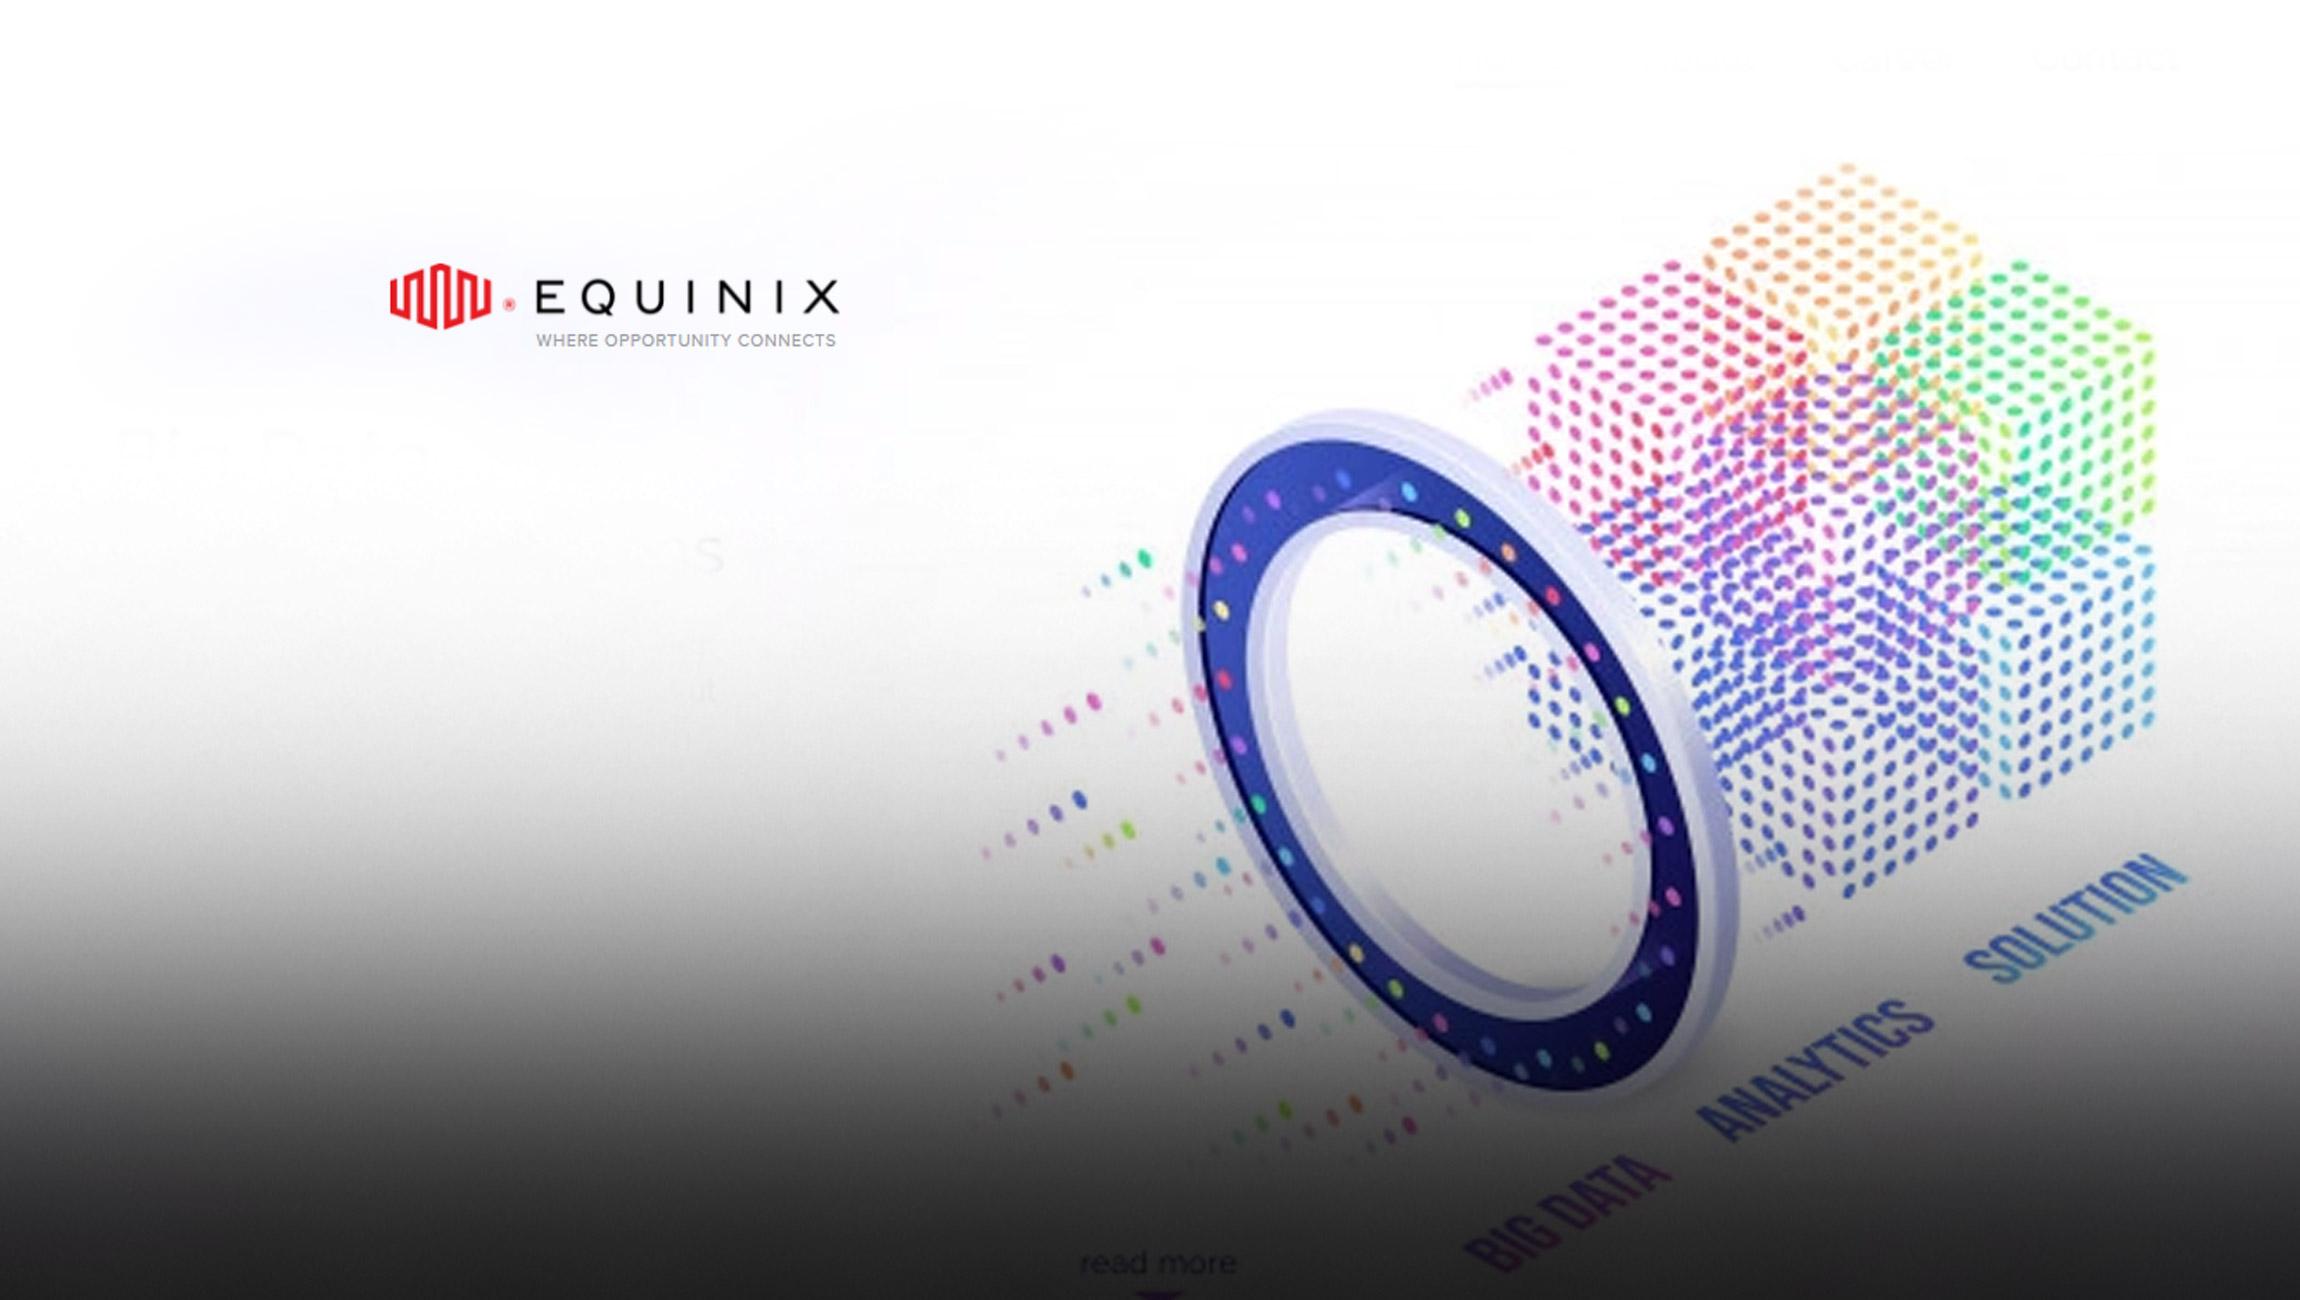 Equinix Revolutionizes How Enterprises Connect Digital Infrastructure